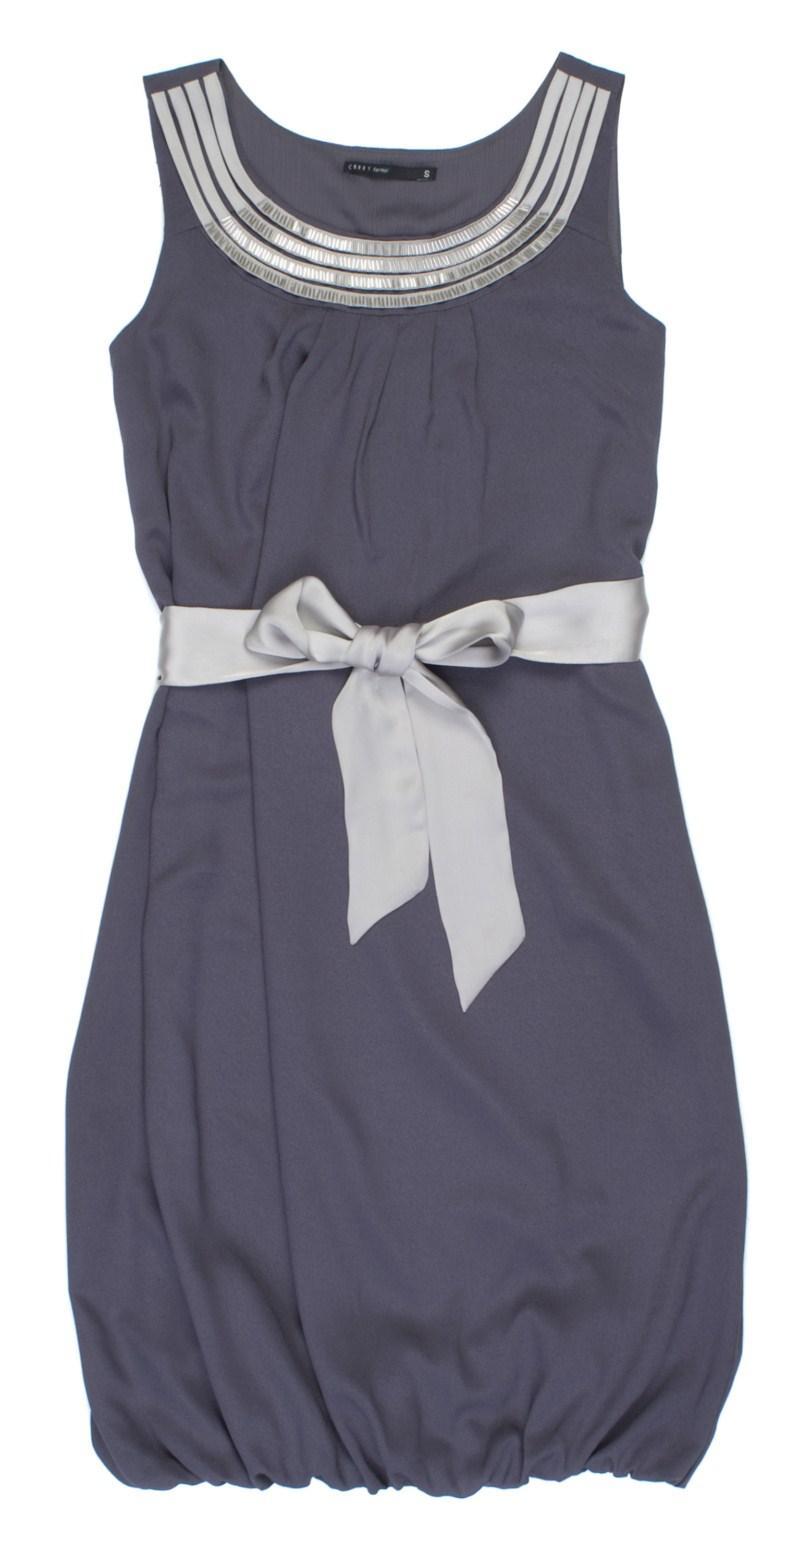 granatowa sukienka Carry - wiosna/lato 2011